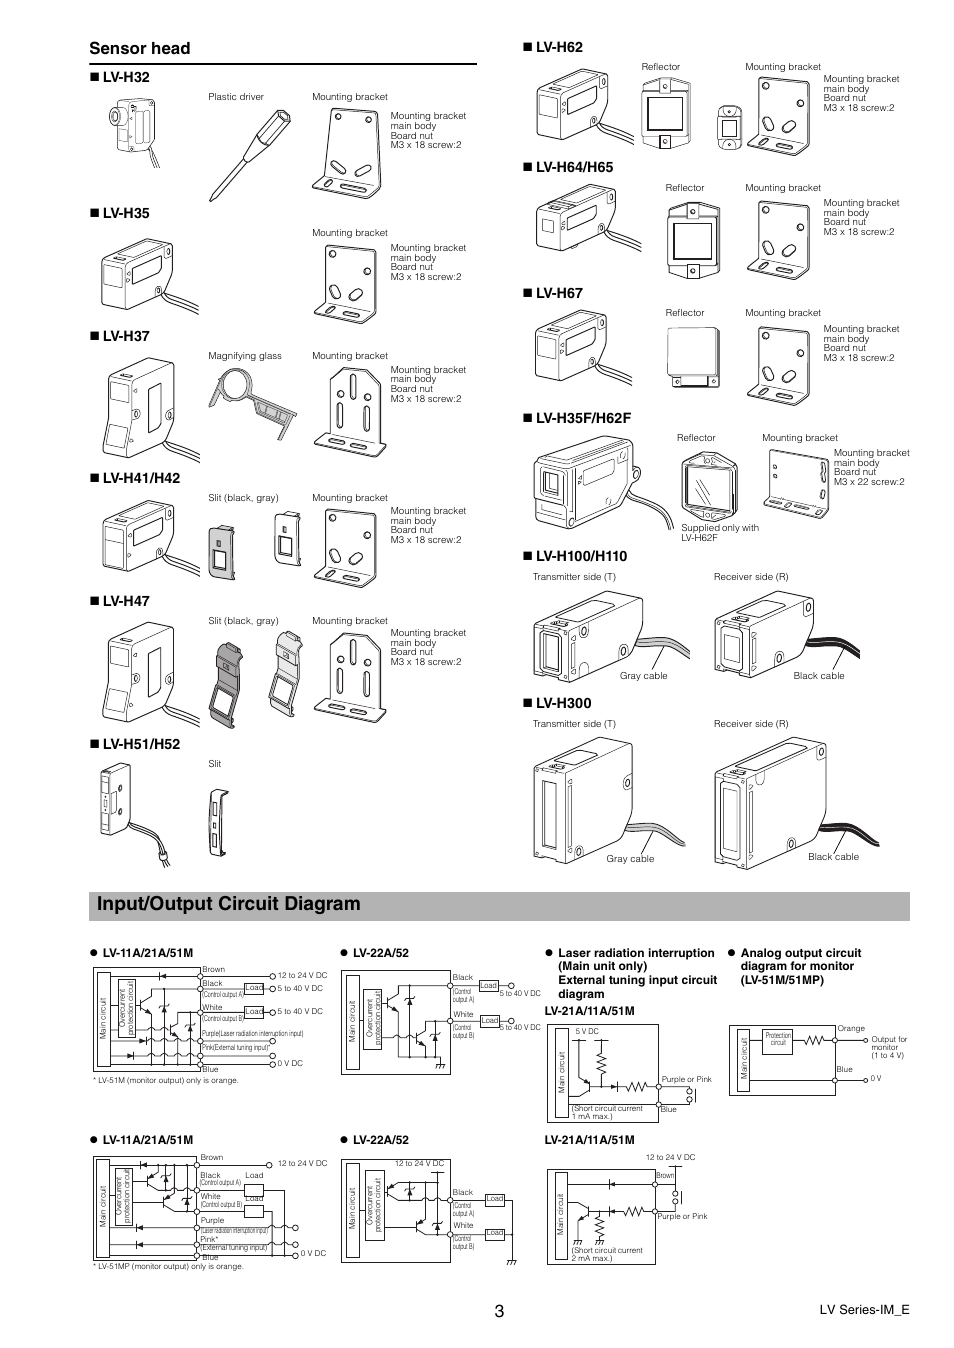 input output circuit diagram sensor head lv series im e. Black Bedroom Furniture Sets. Home Design Ideas